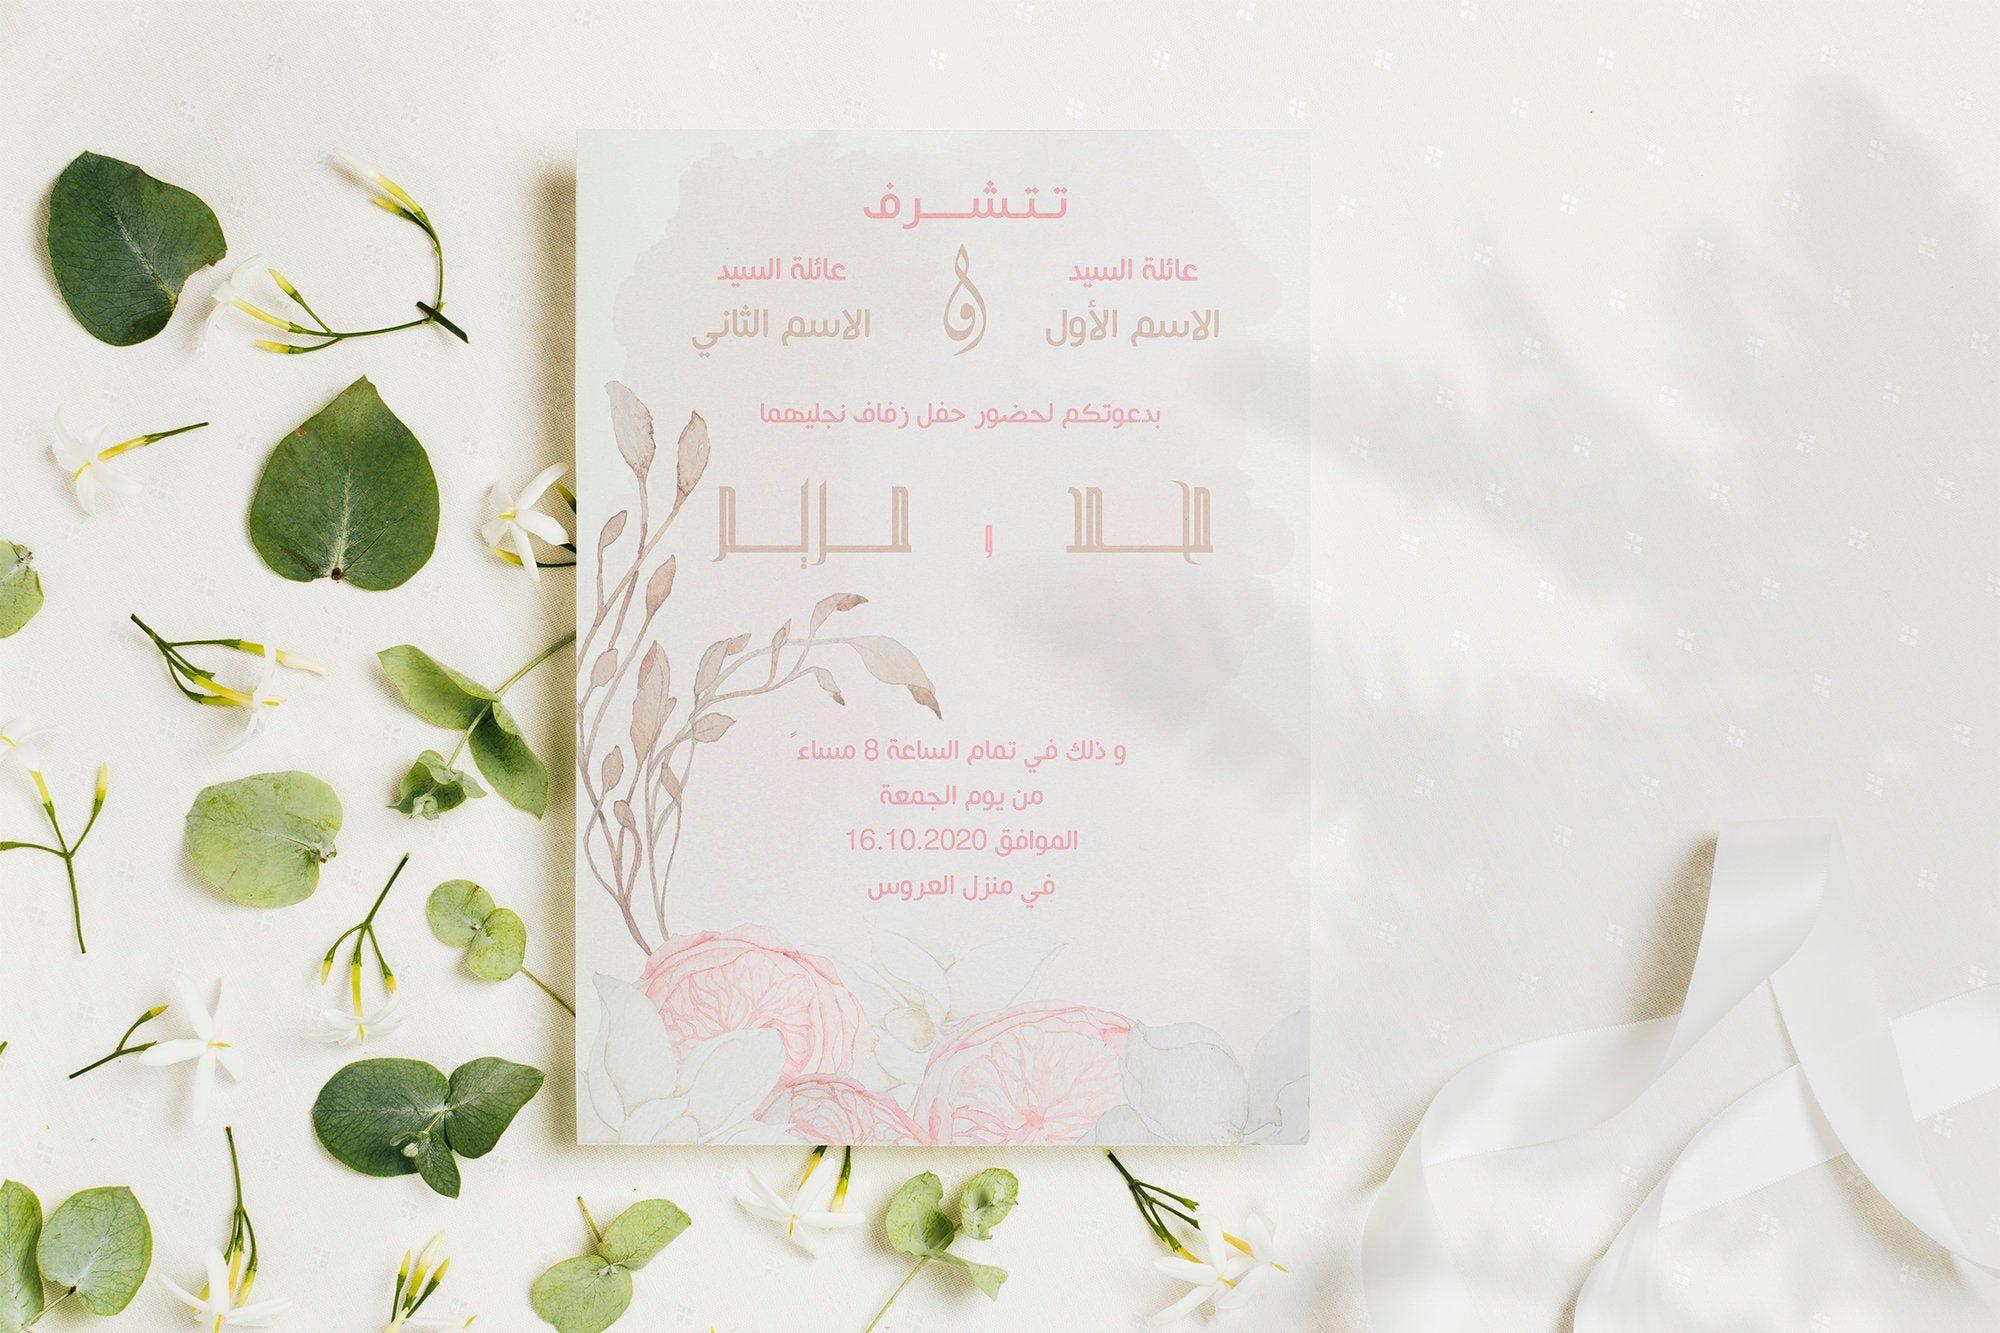 Arabic Wedding Invite Premade زفاف اعلان زواج Etsy Invitations Wedding Invitations Arab Wedding